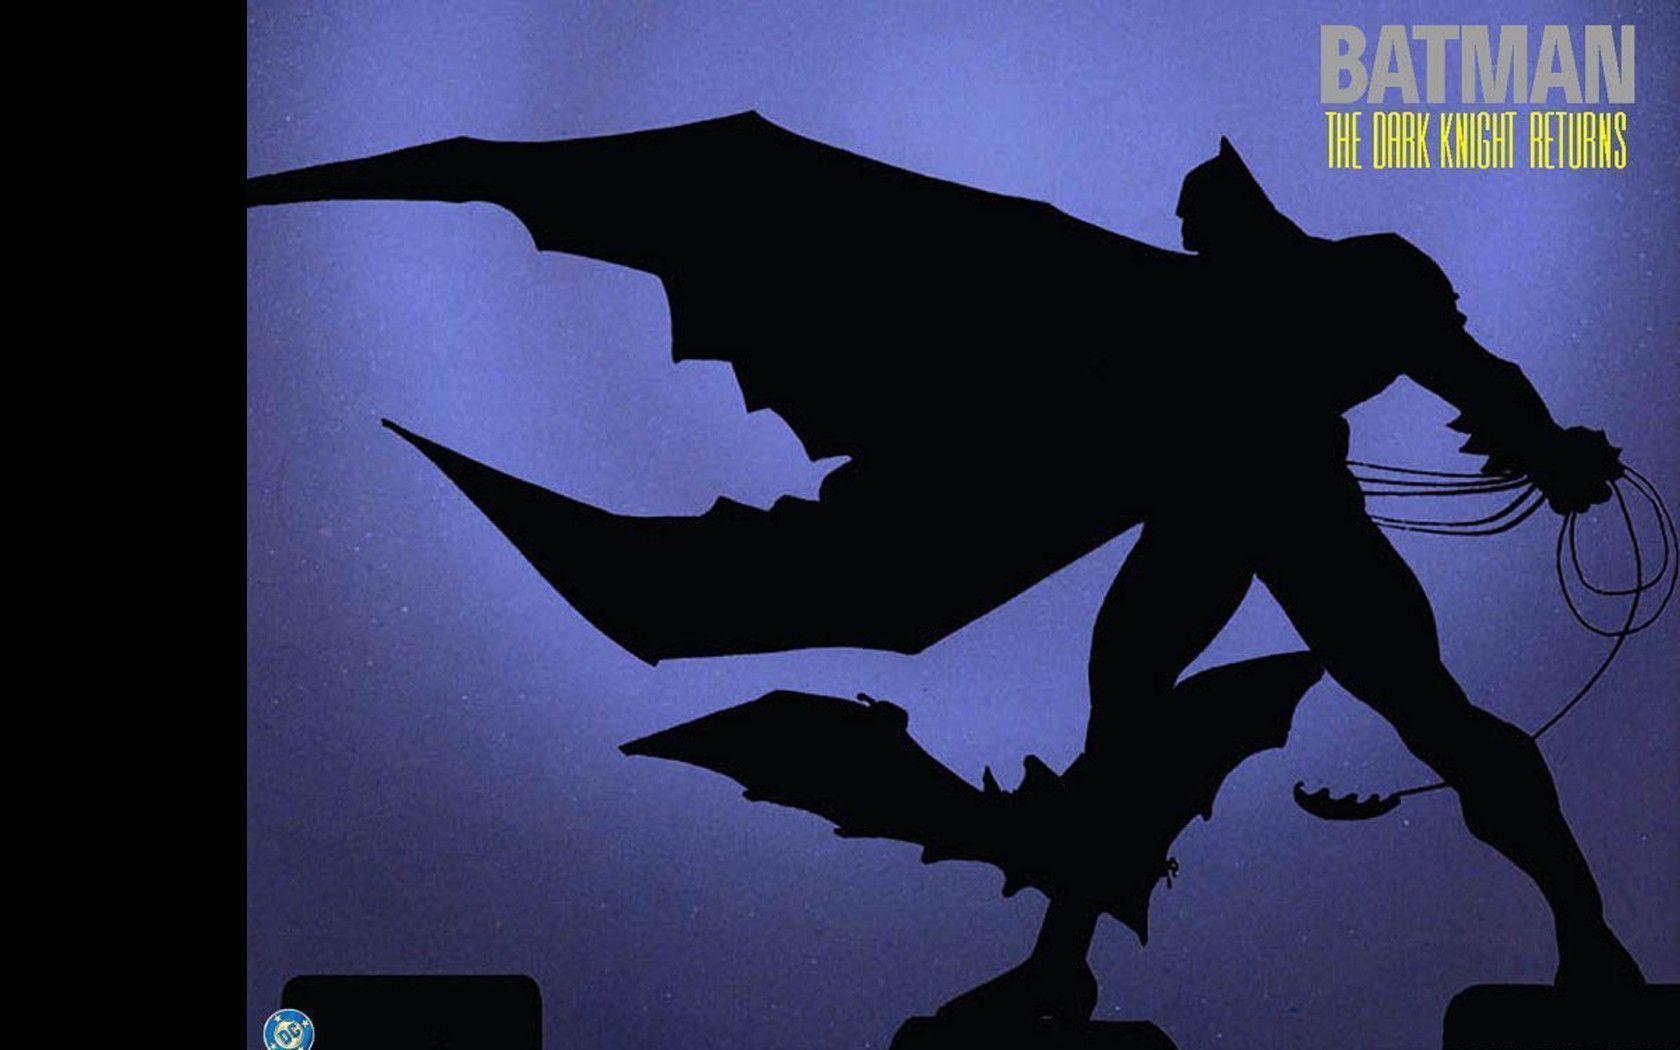 The Dark Knight Returns Wallpapers Wallpaper Cave